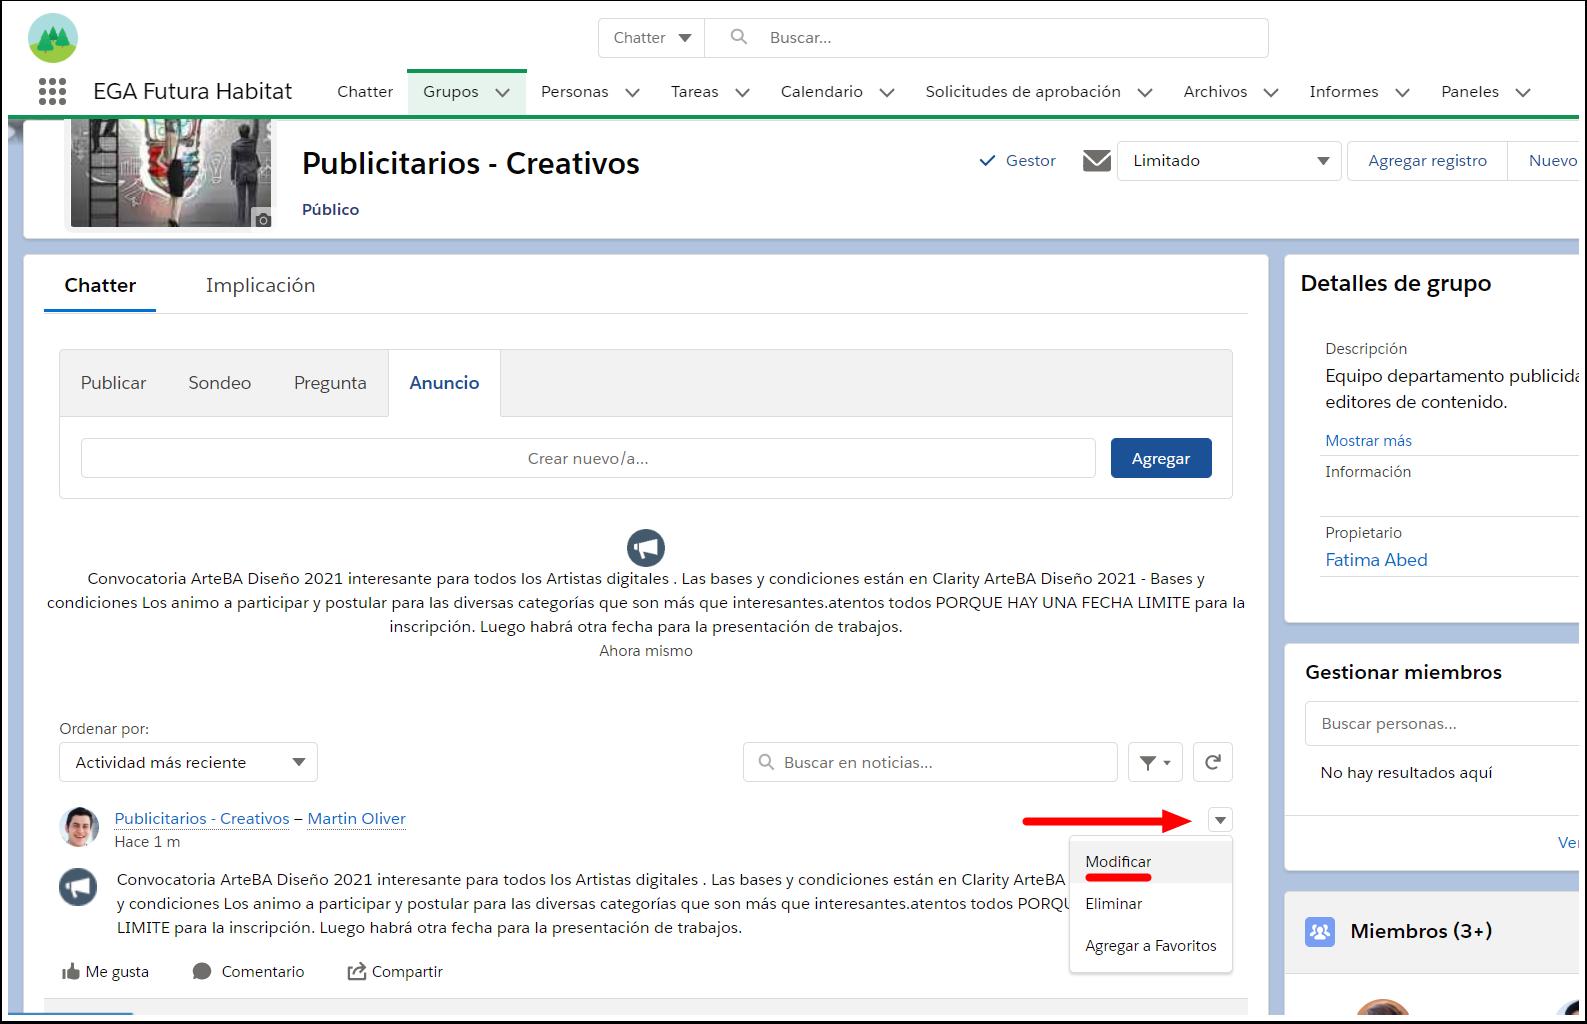 Modificar editar anuncio Grupo Chatter EGA Futura ERP nube